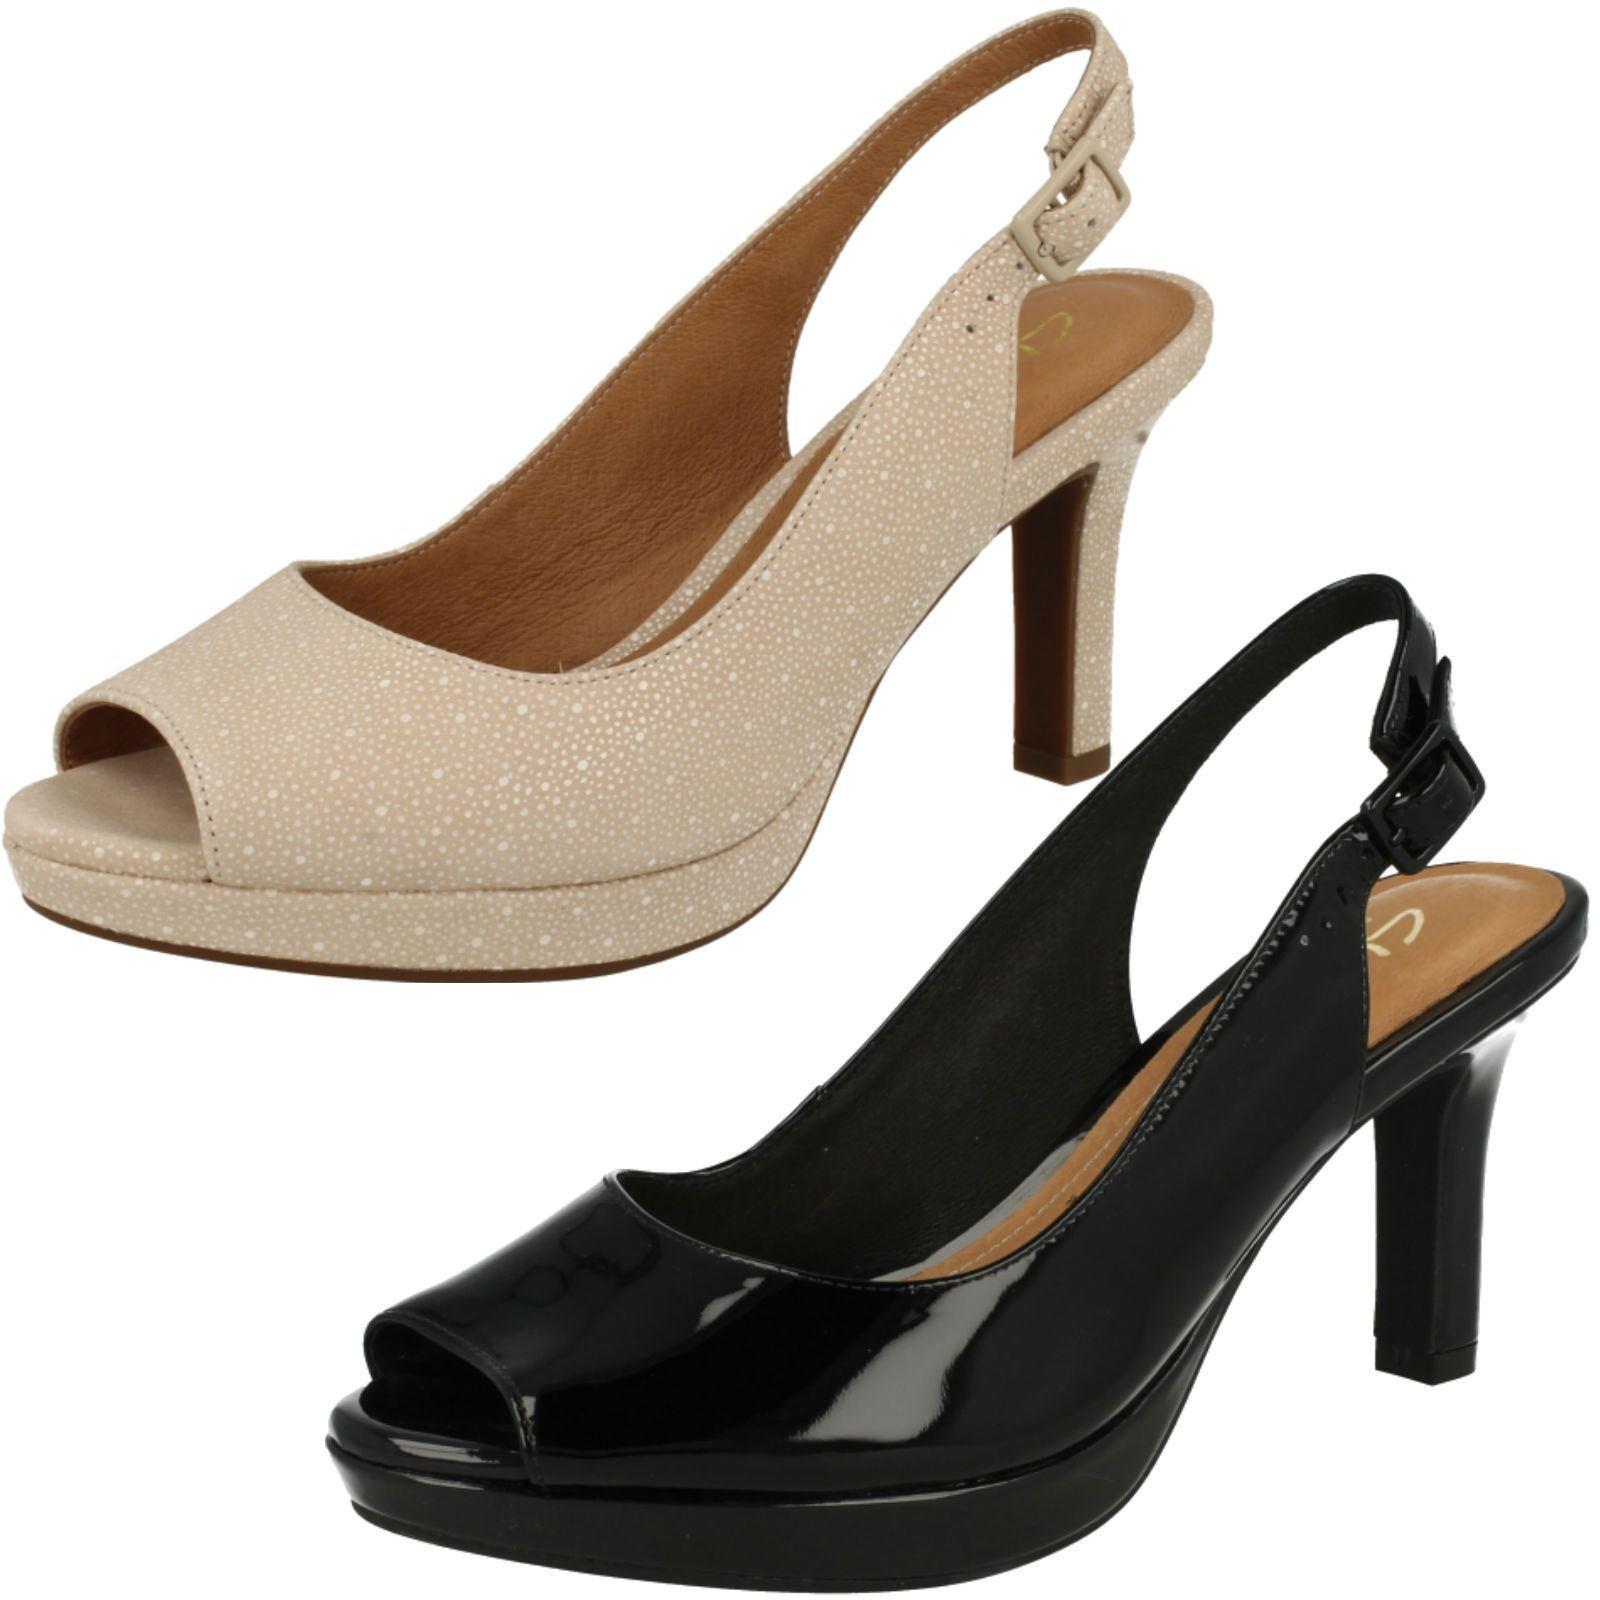 Ladies Clarks Mayra Blossom Open Toe Smart Slingback Sandals